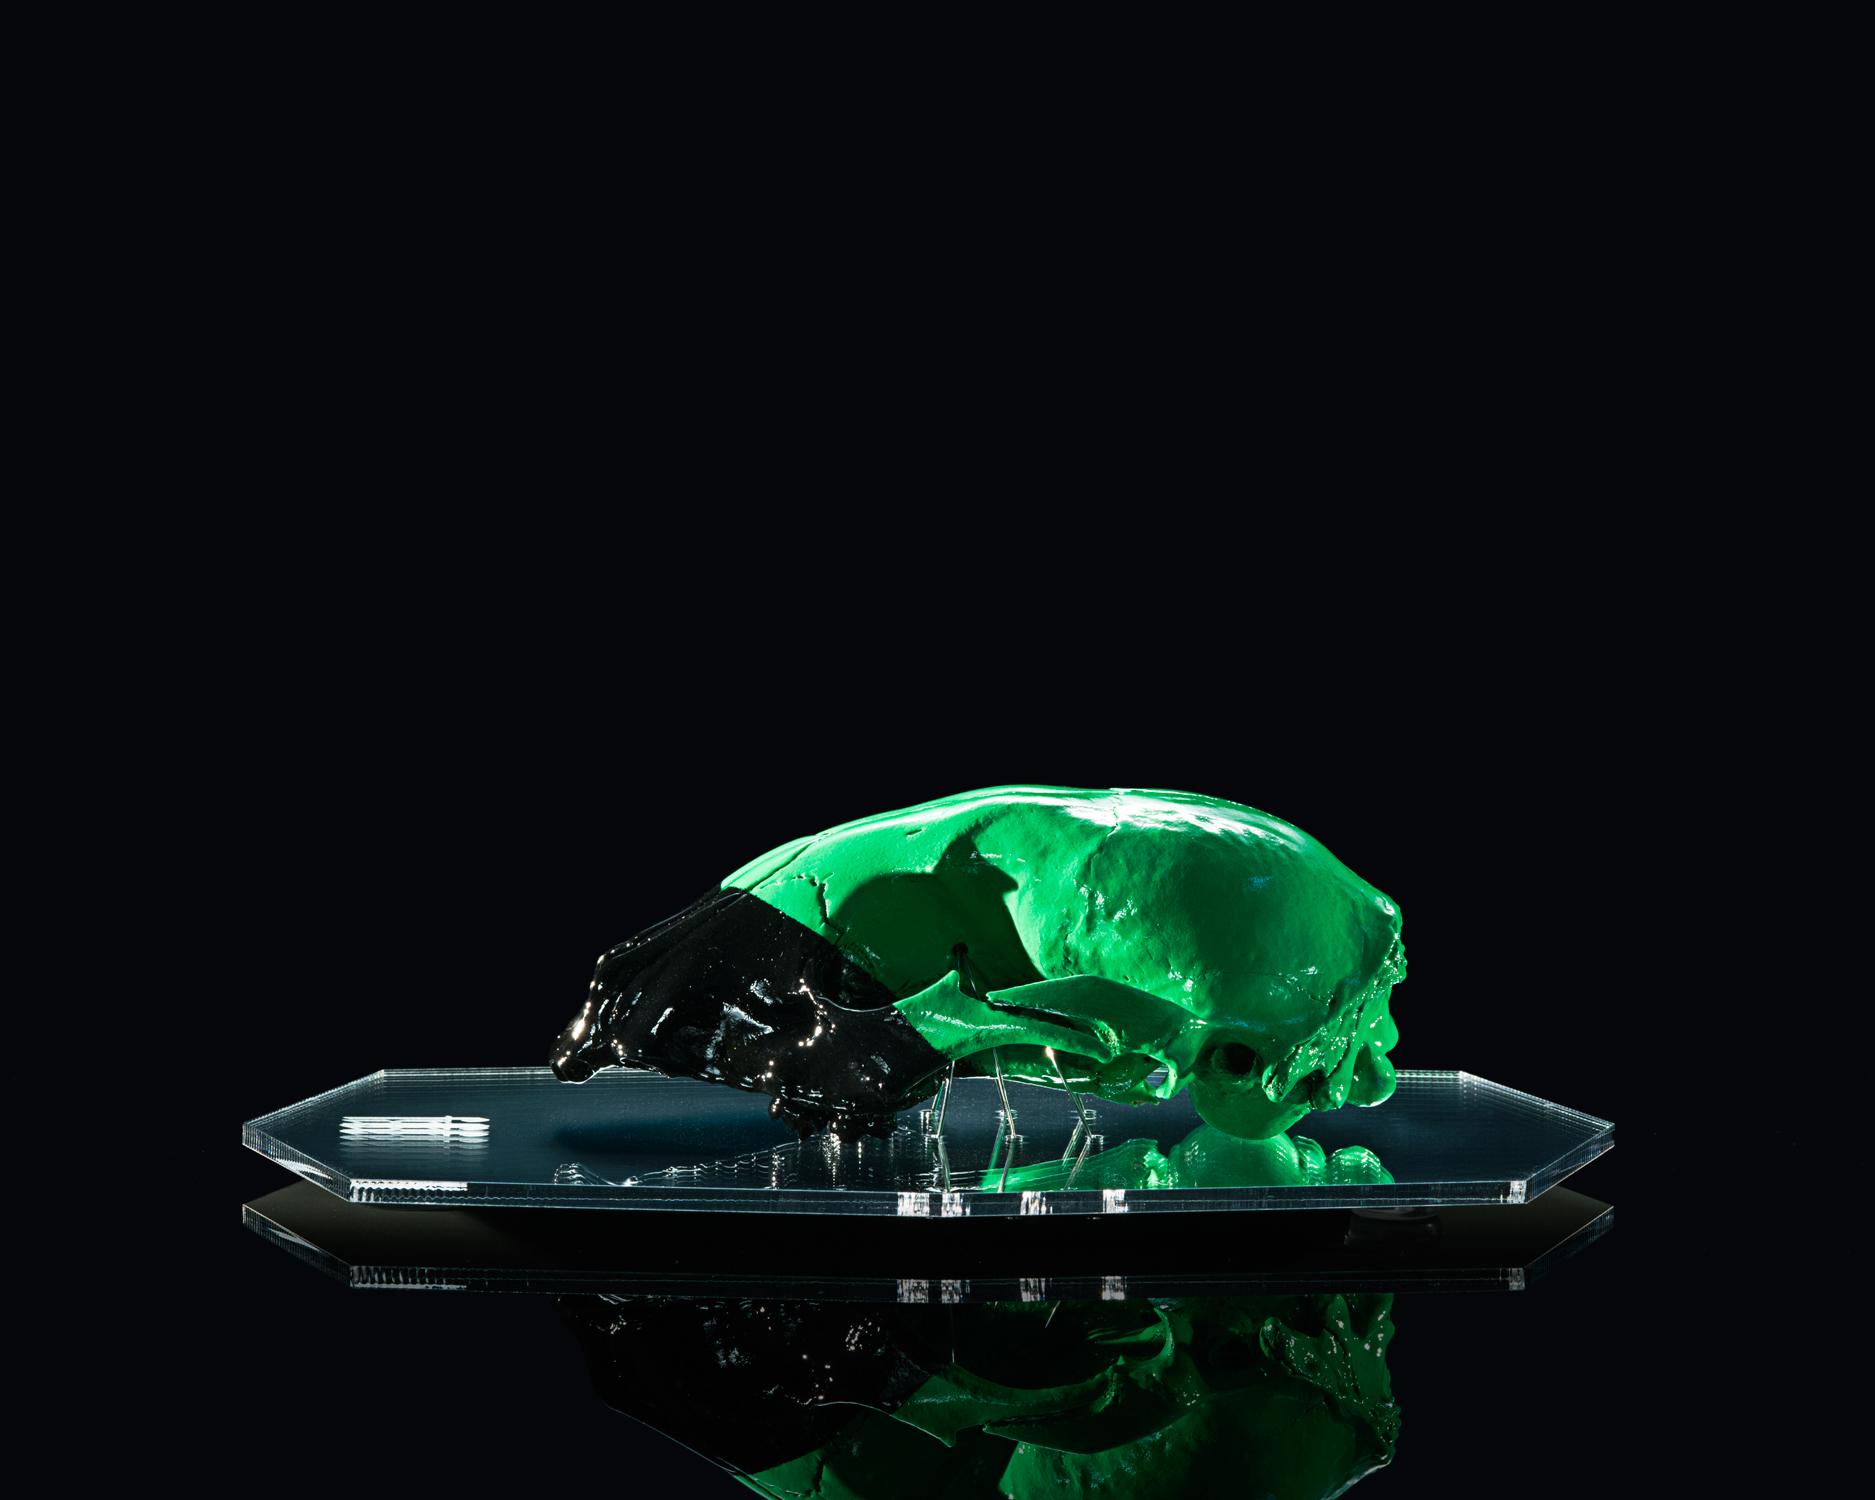 Green & Black - Racoon